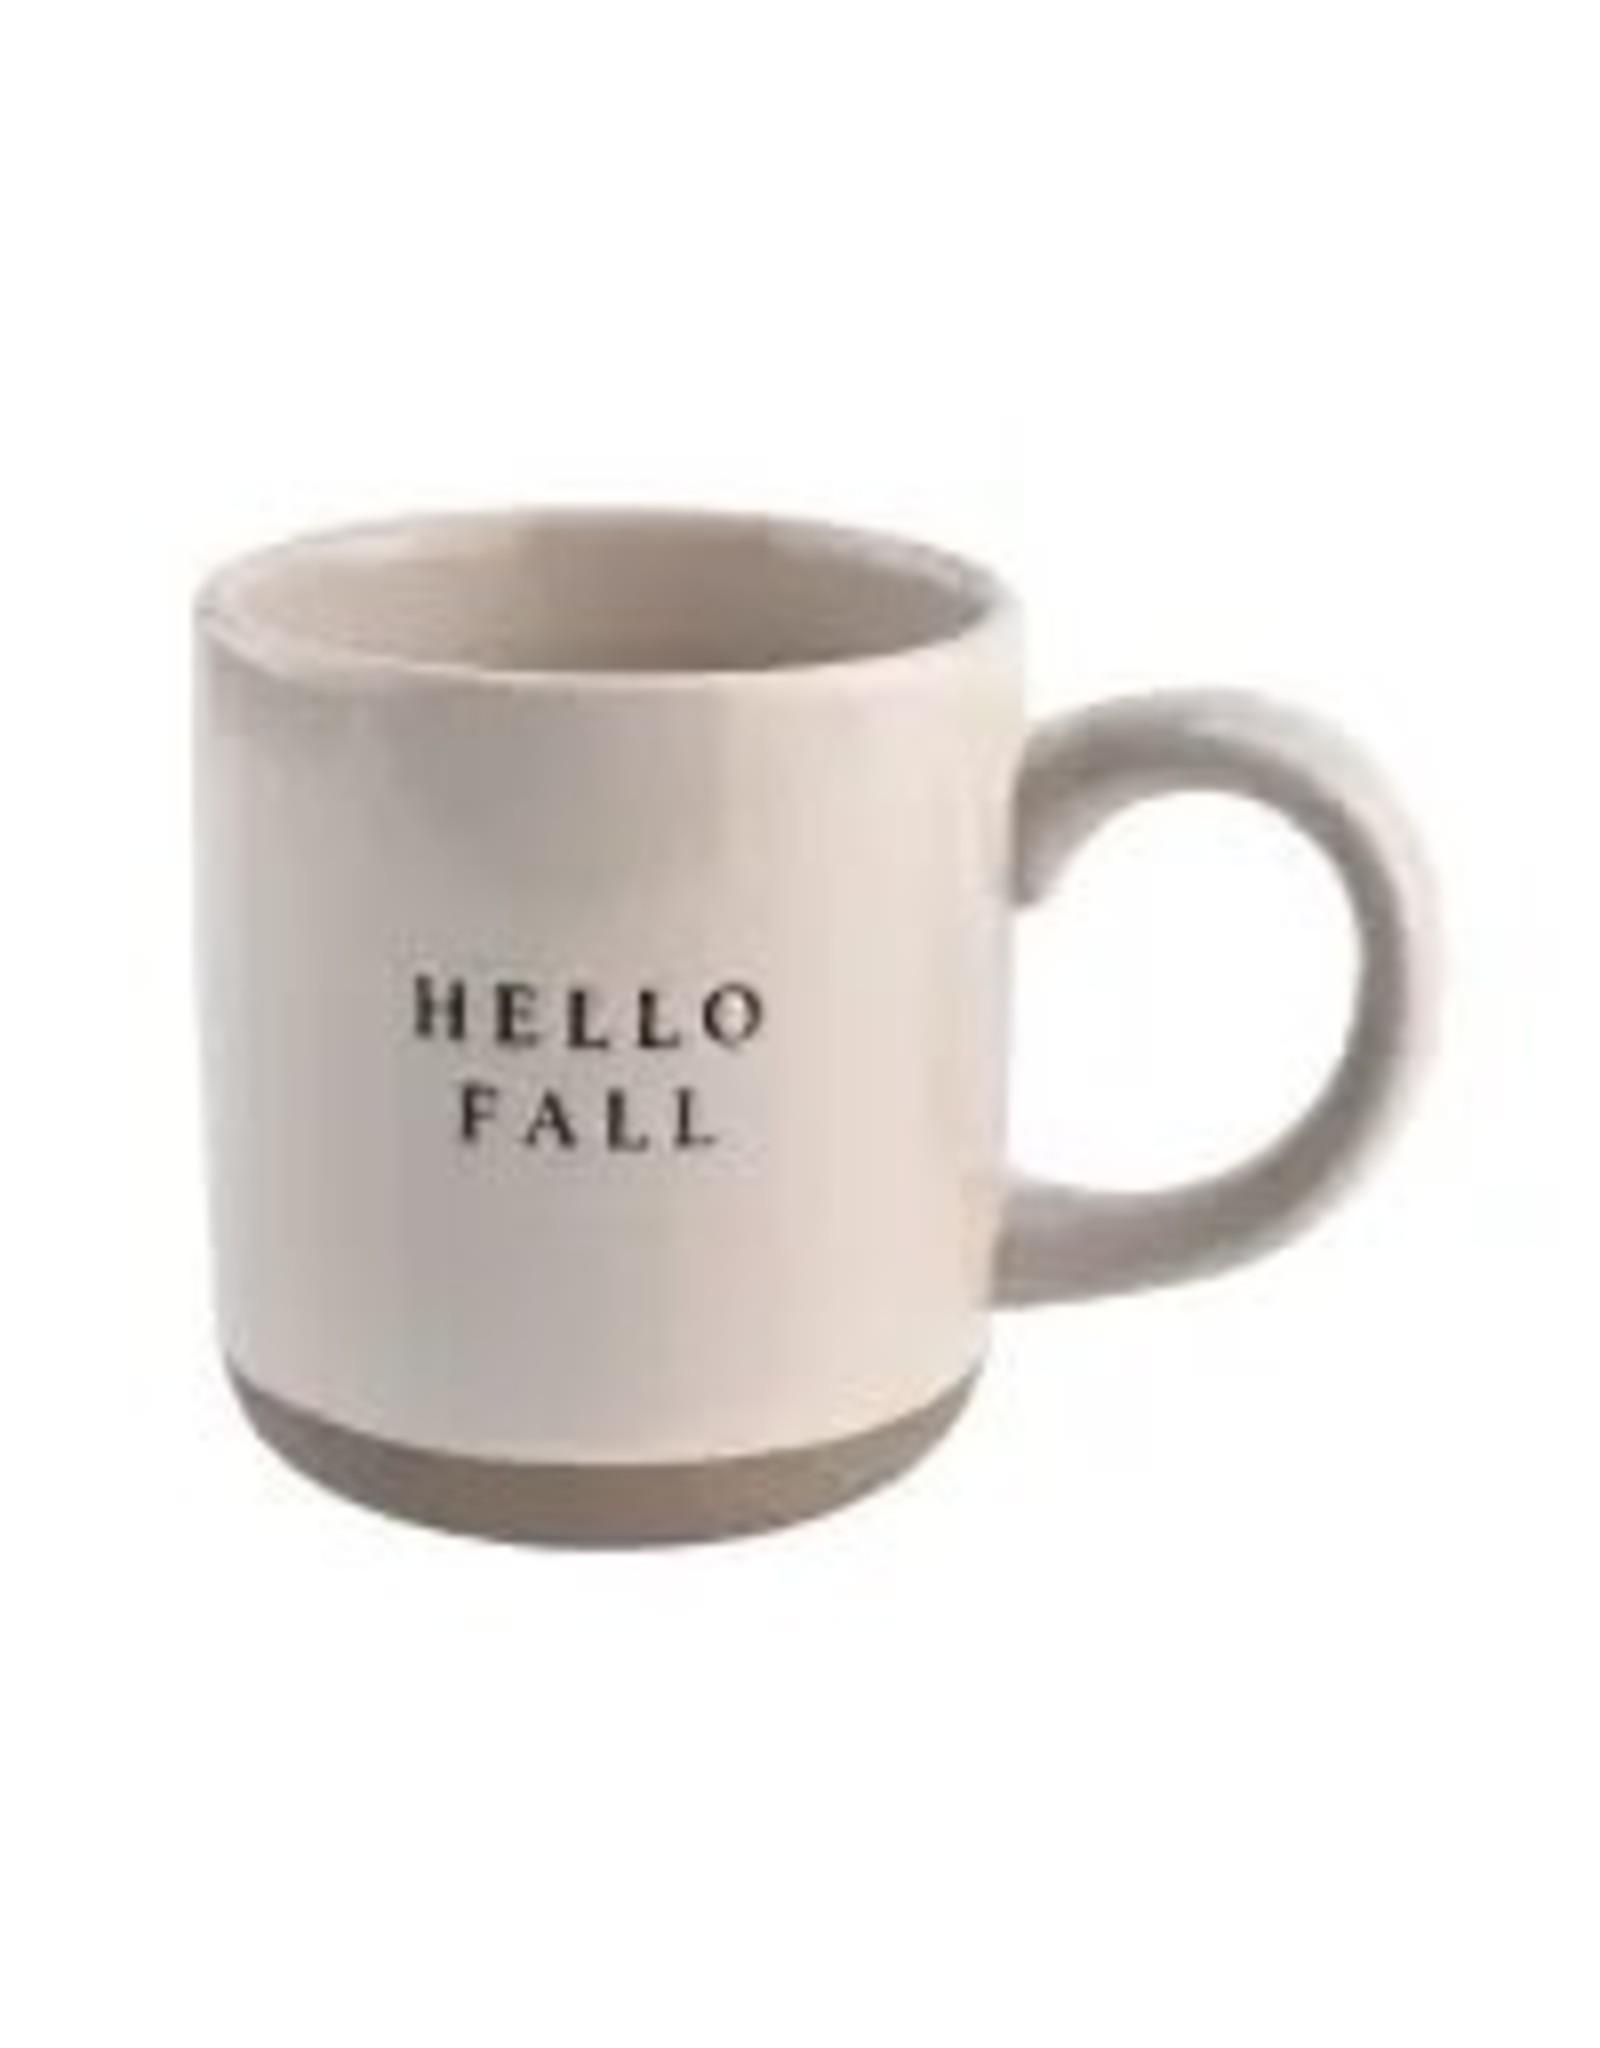 The Florist & The Merchant Stoneware Coffee Mug